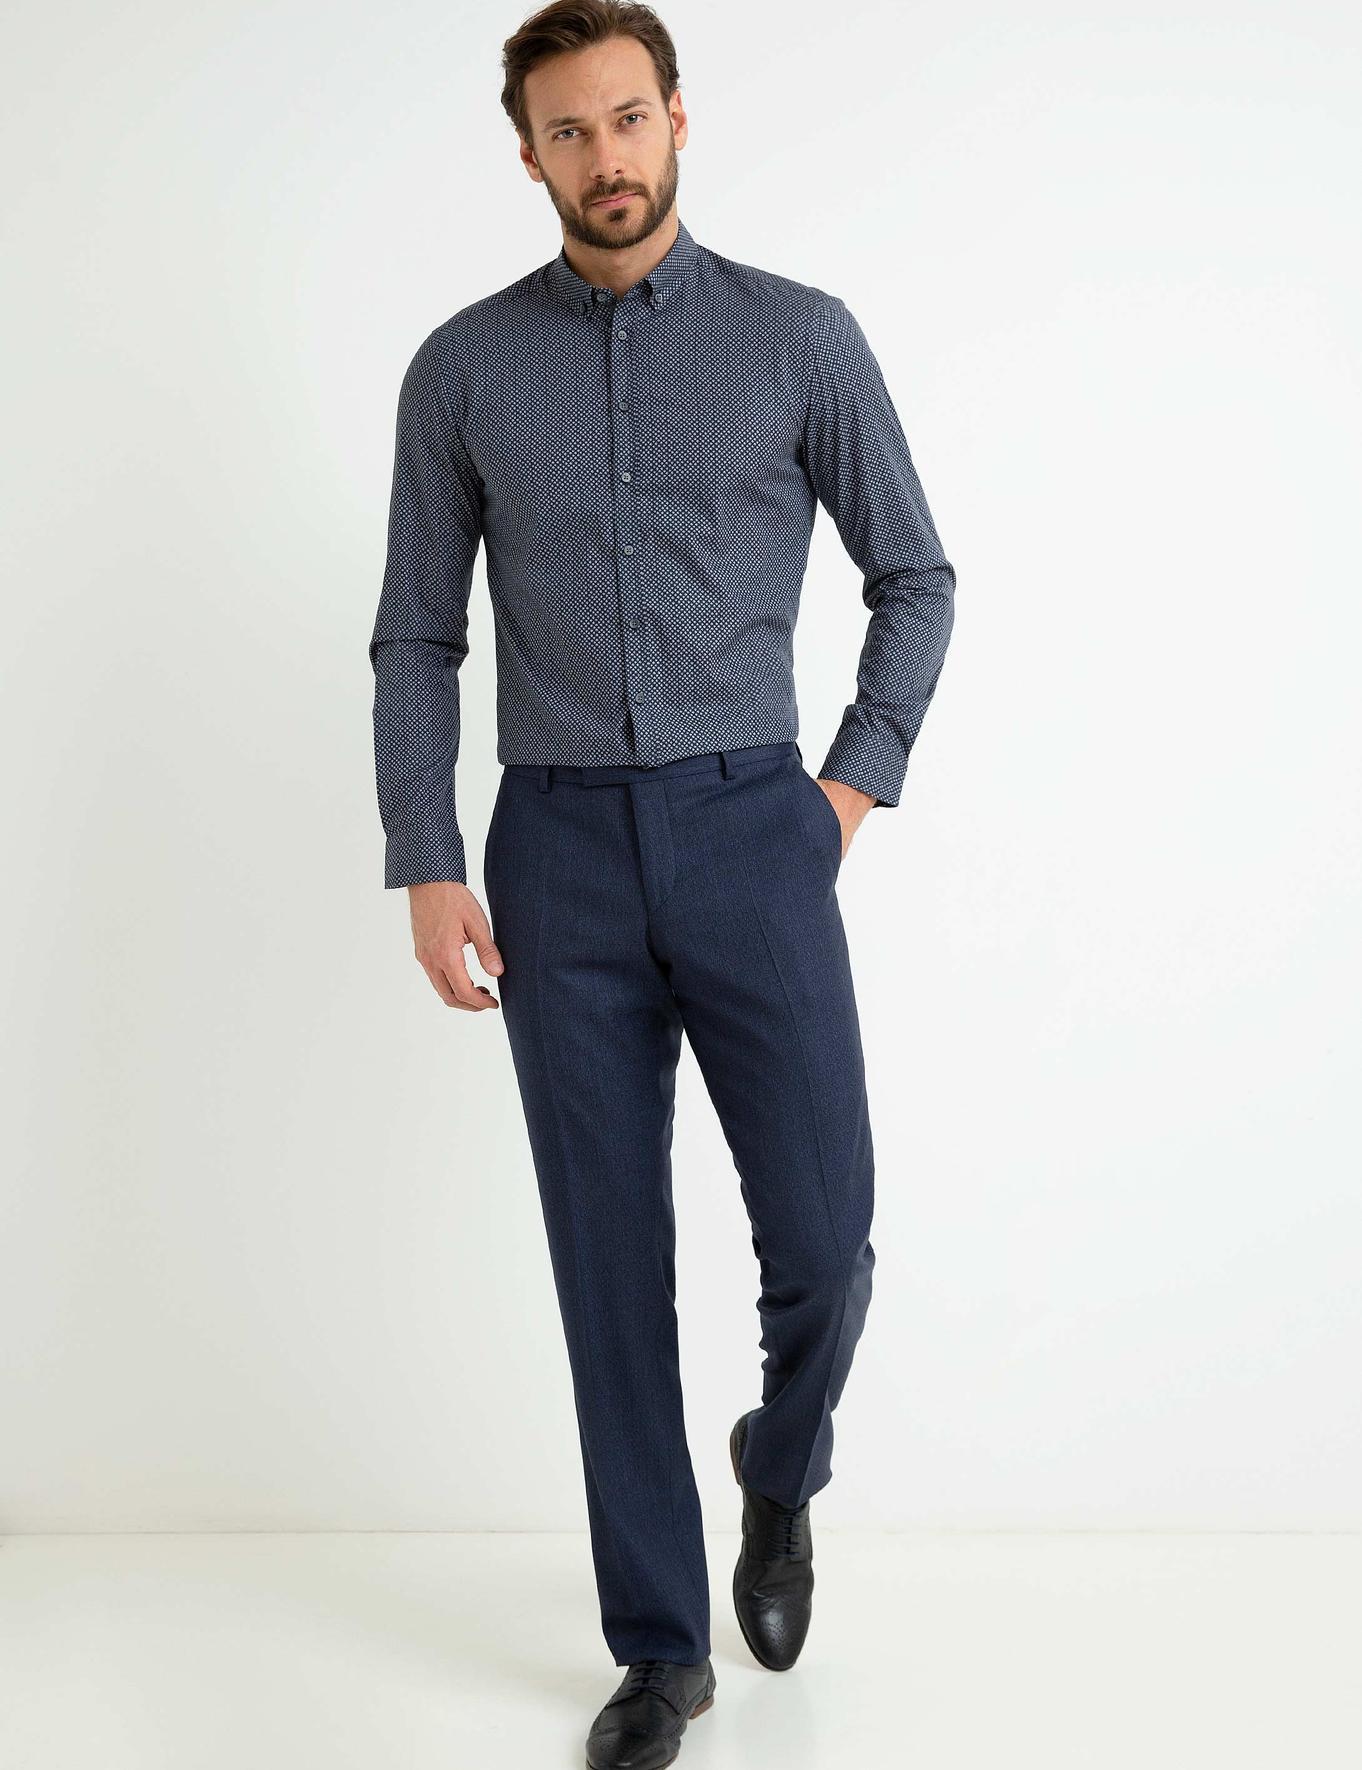 Lacivert Slim Fit Gömlek - 50193011005